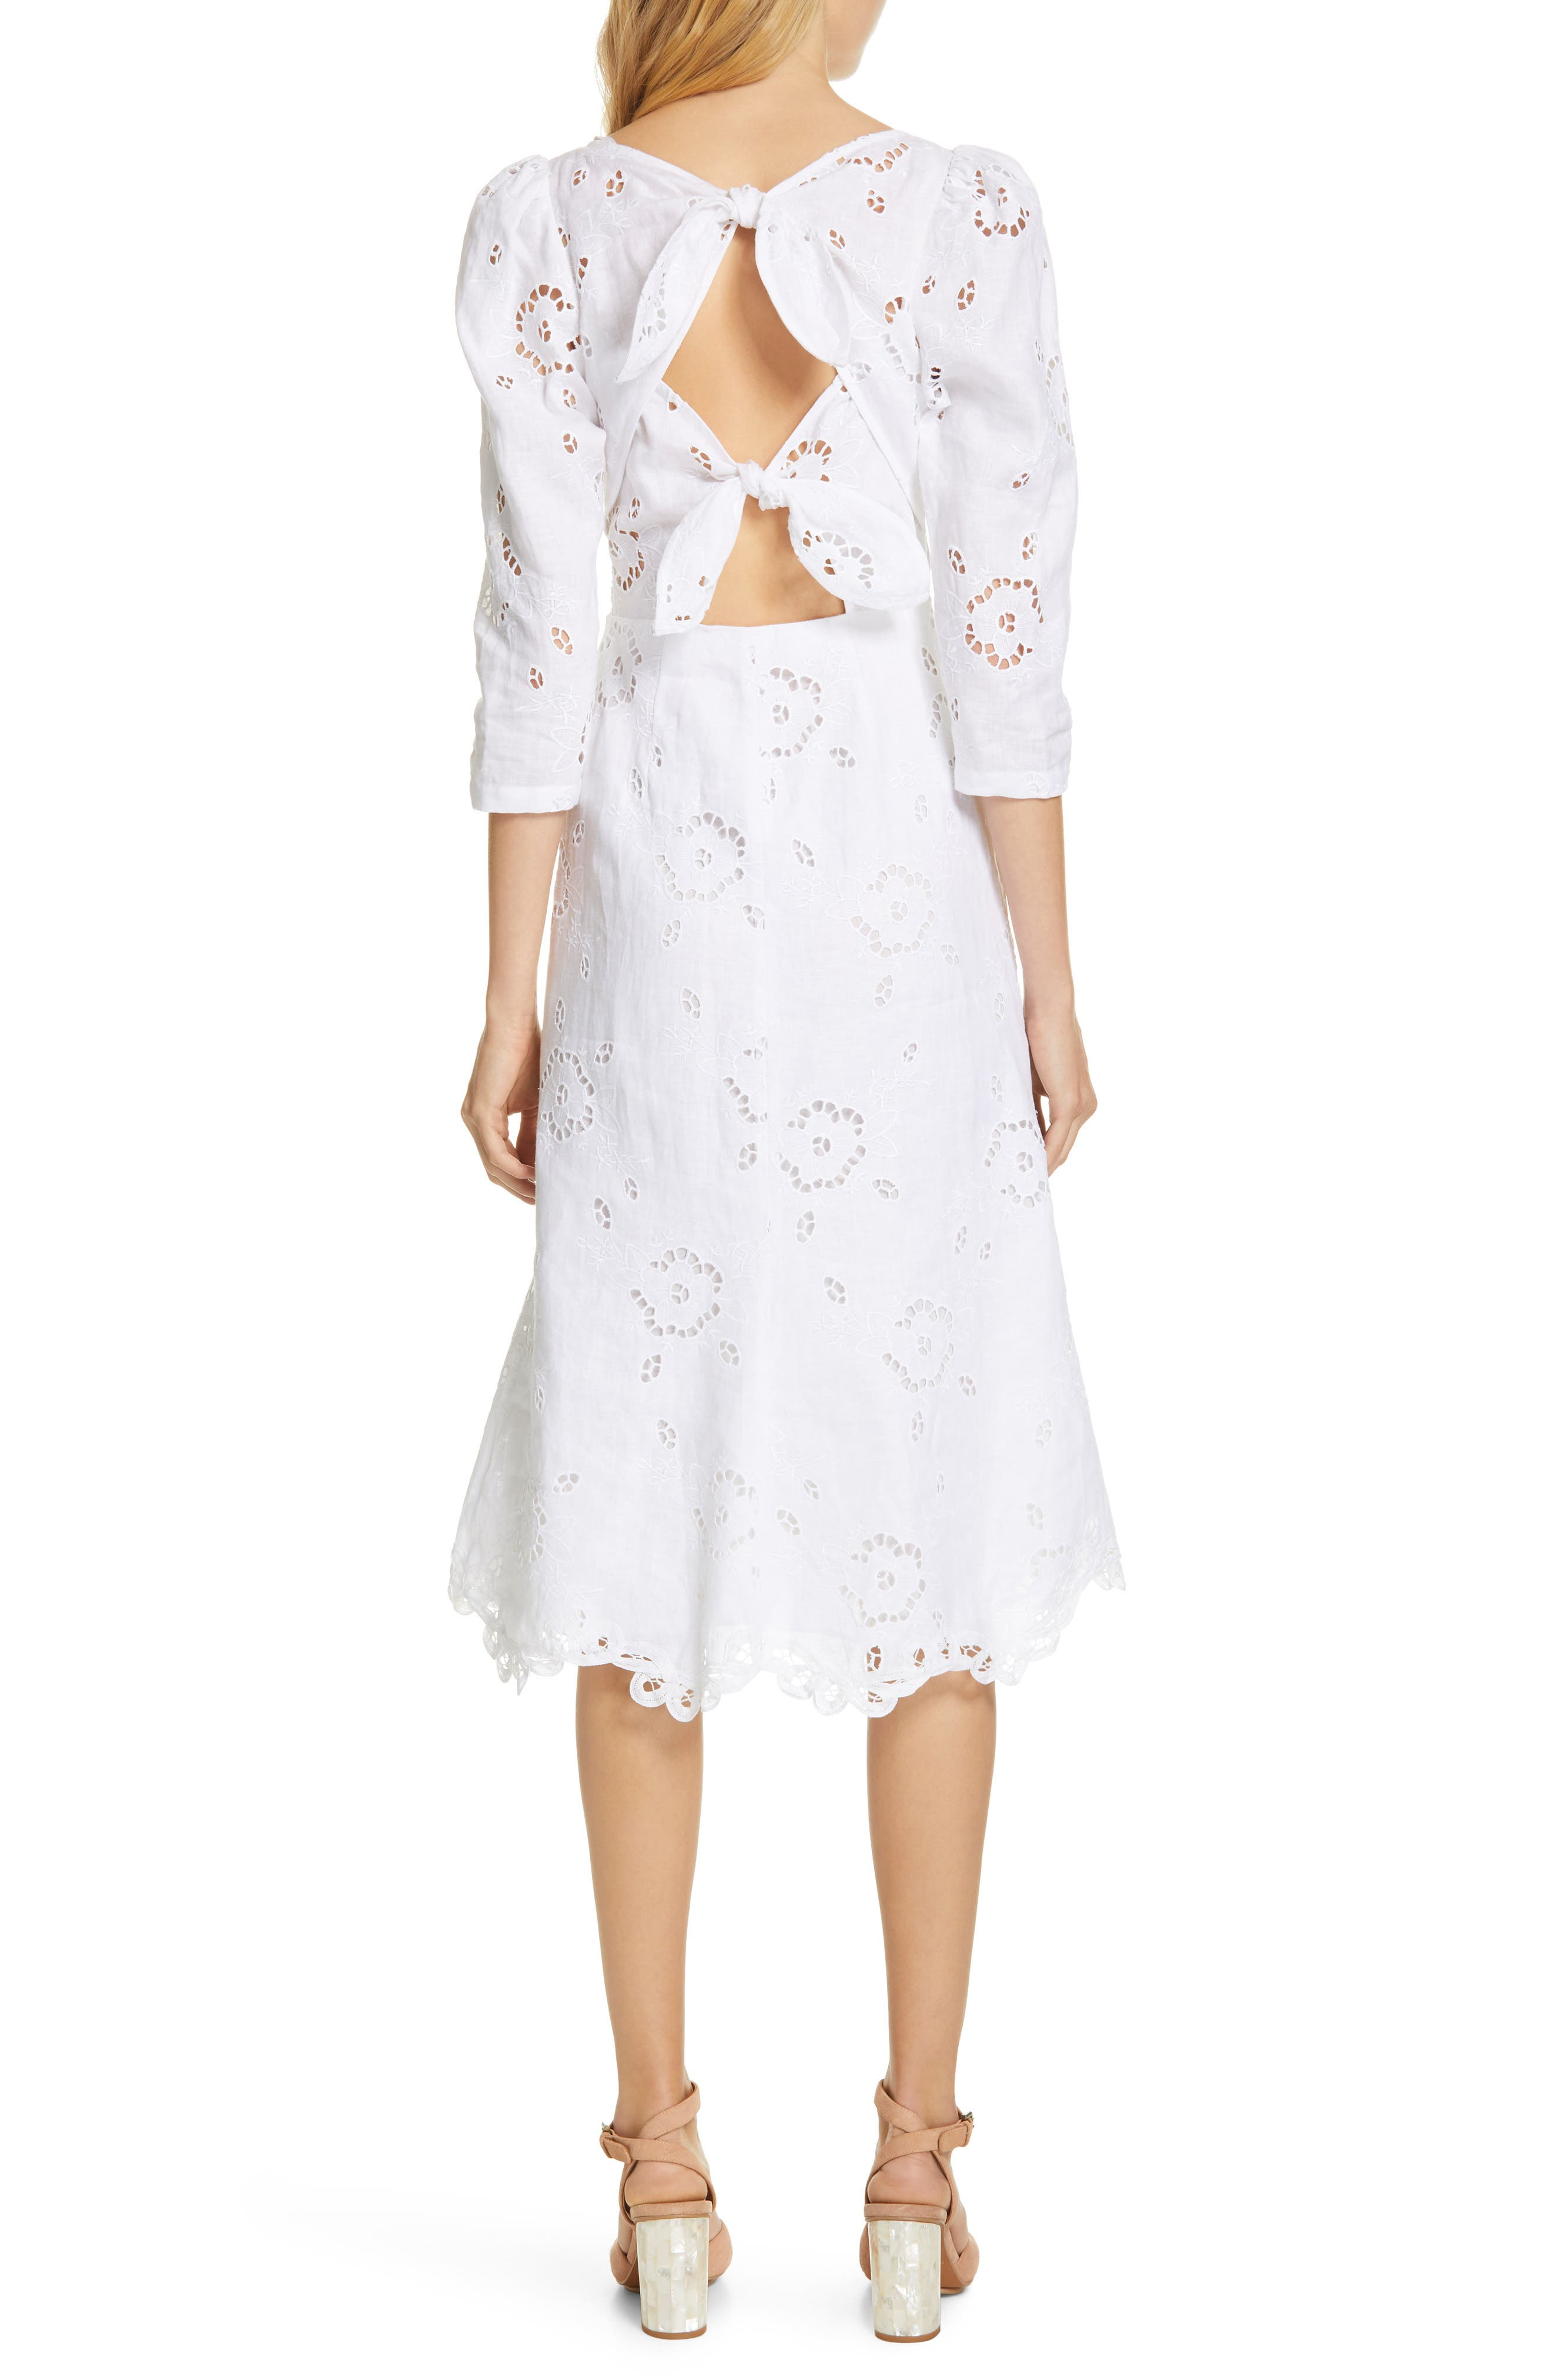 REBECCA TAYLOR,                             Terri Embroidered A-Line Dress,                             Alternate thumbnail 2, color,                             MILK